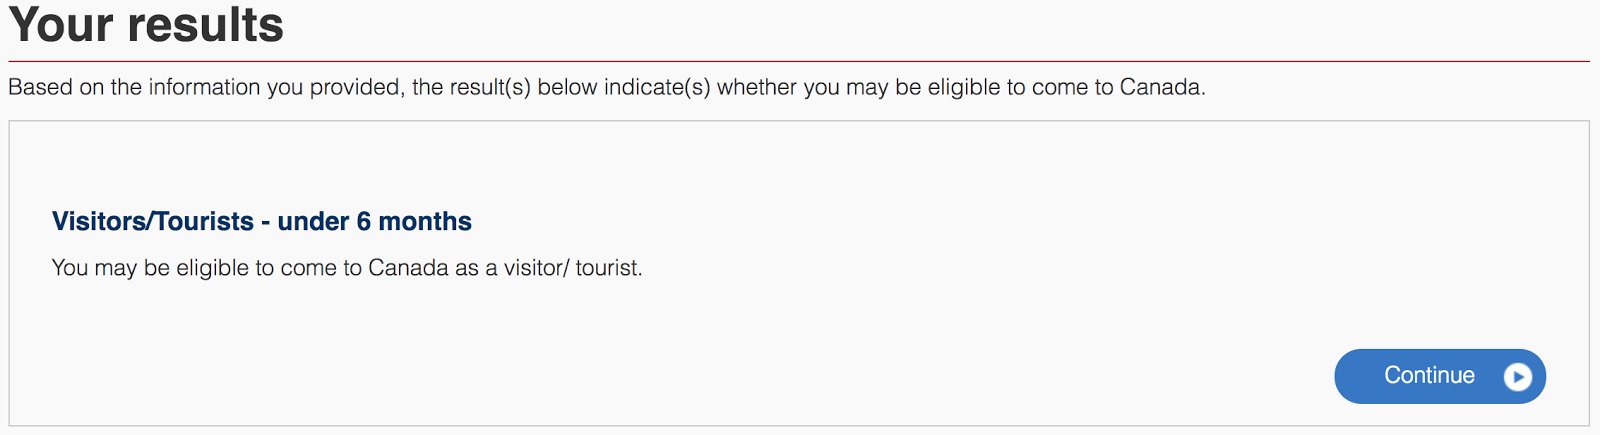 CanadaTouristVisaApplicationGuide_Eligibility Multiple Visa Application Form Canada on